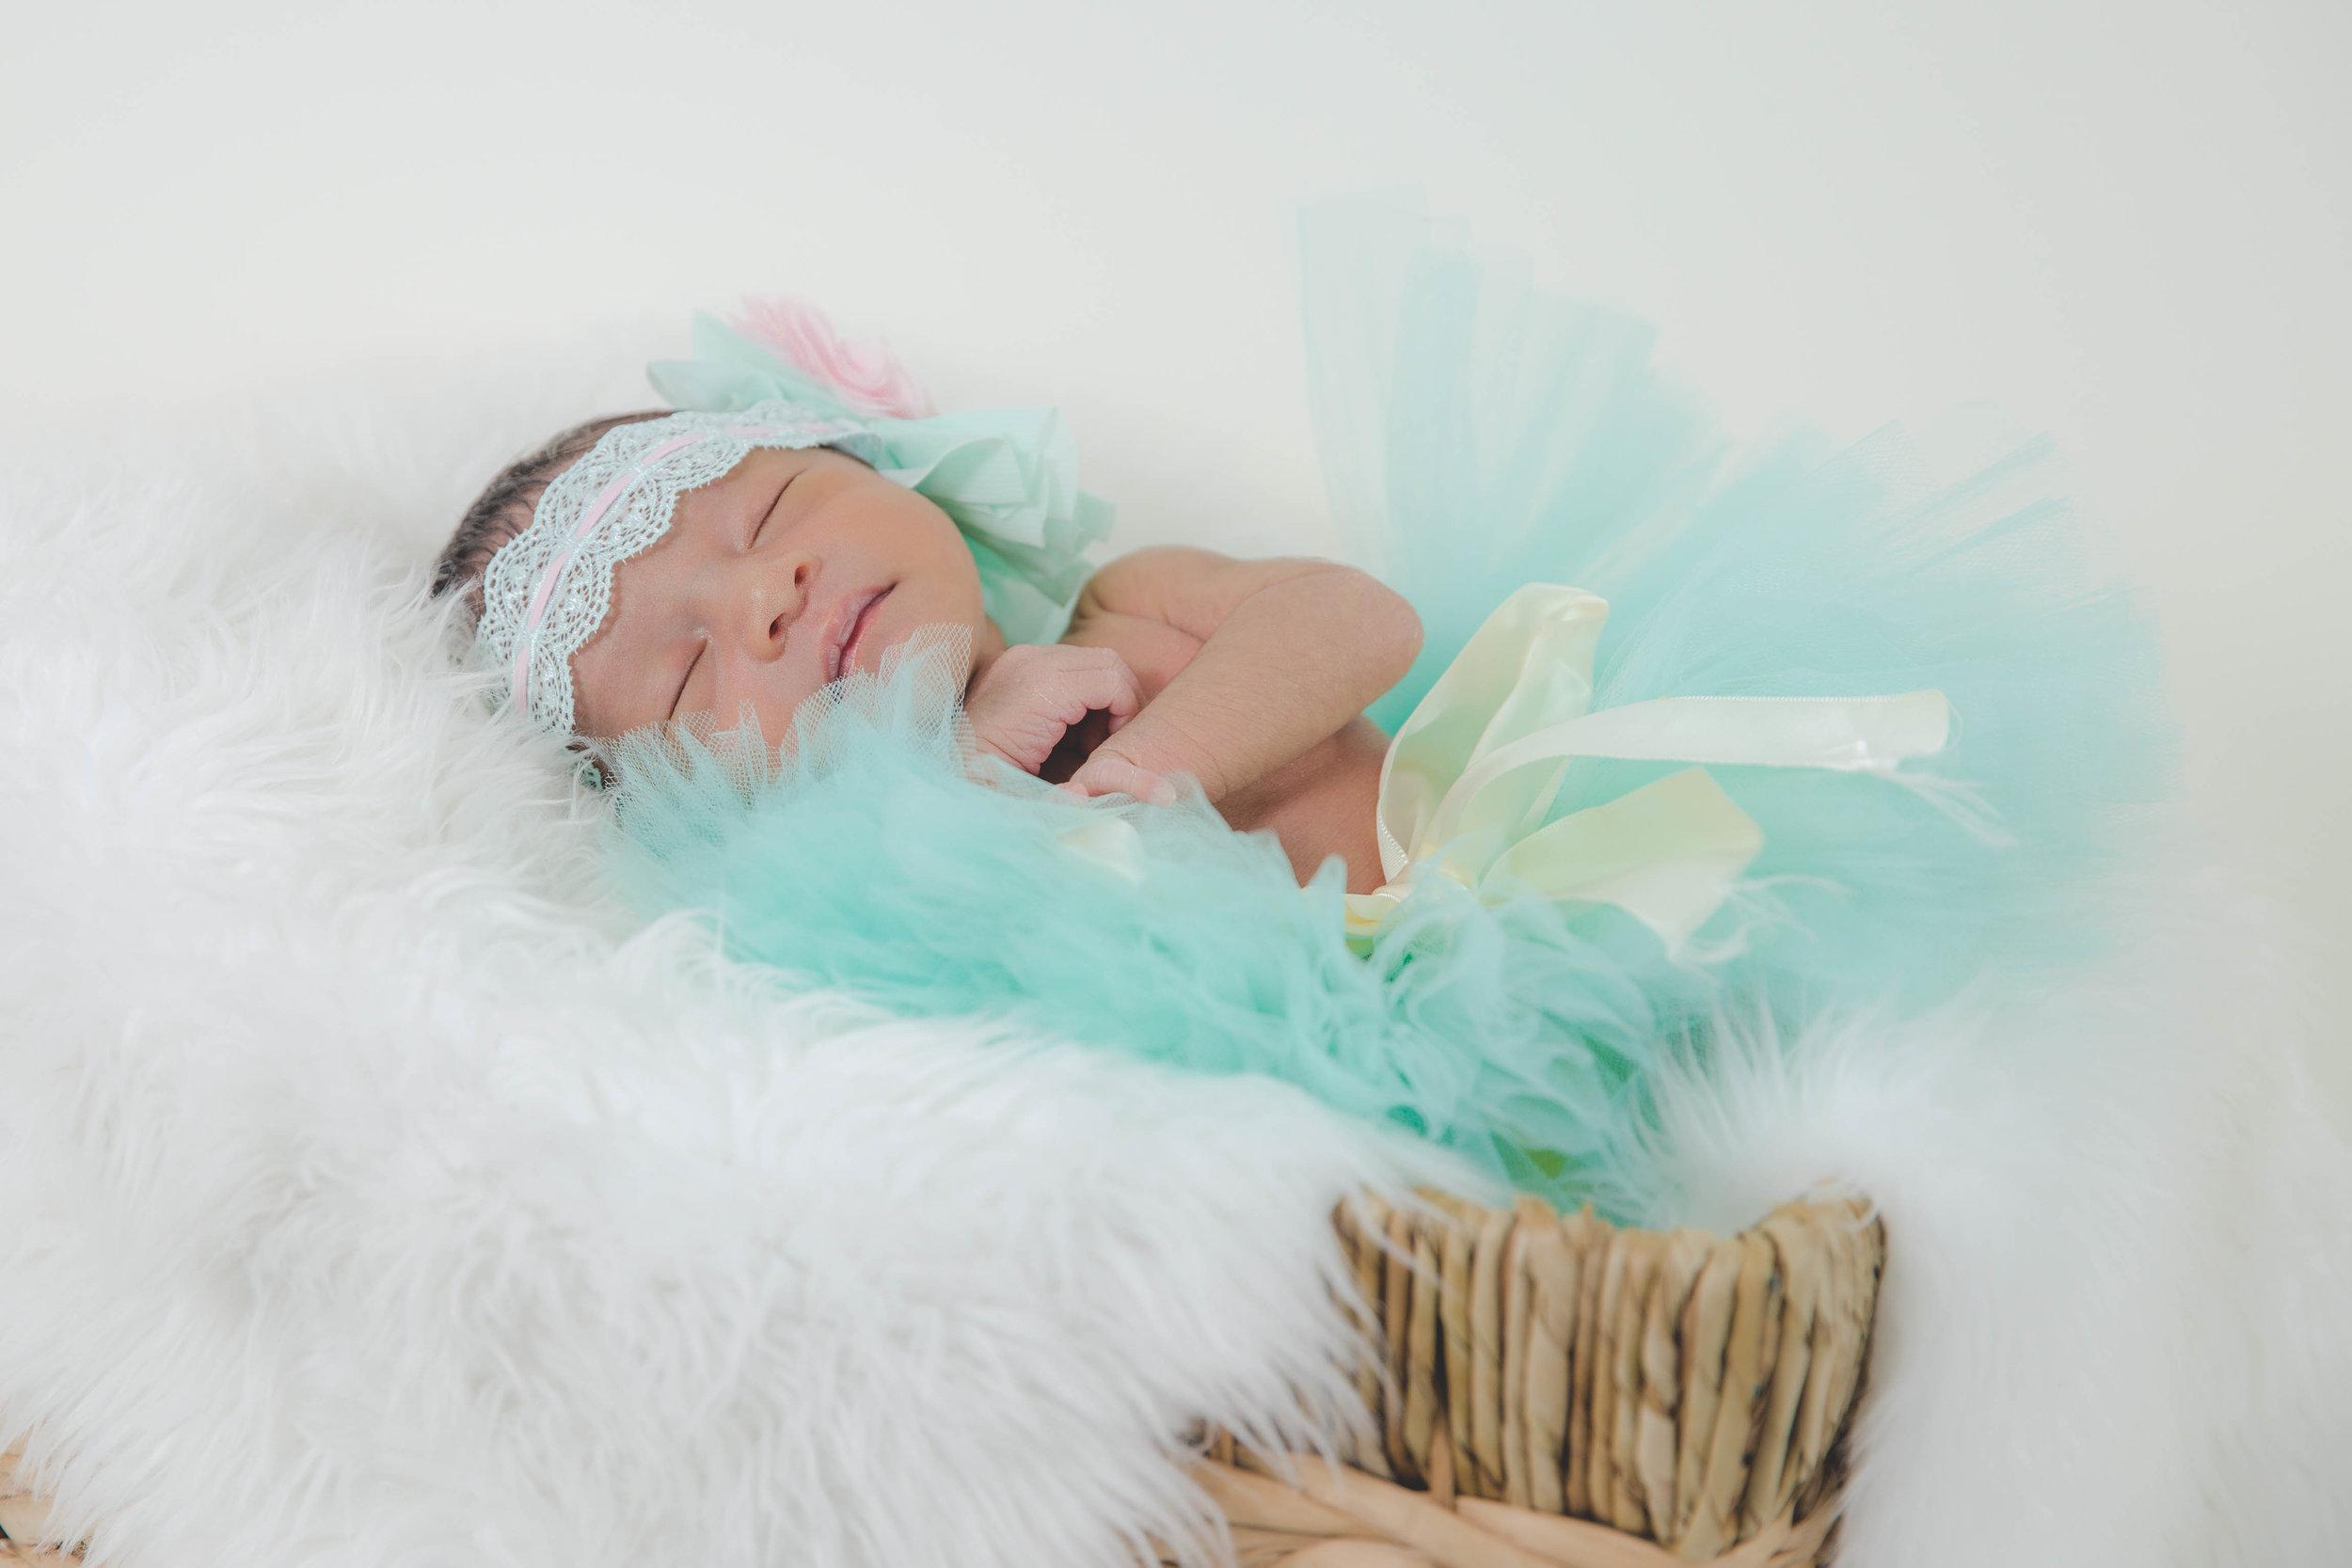 Newborn-photography-nyc-Brooklyn-best-1.jpg